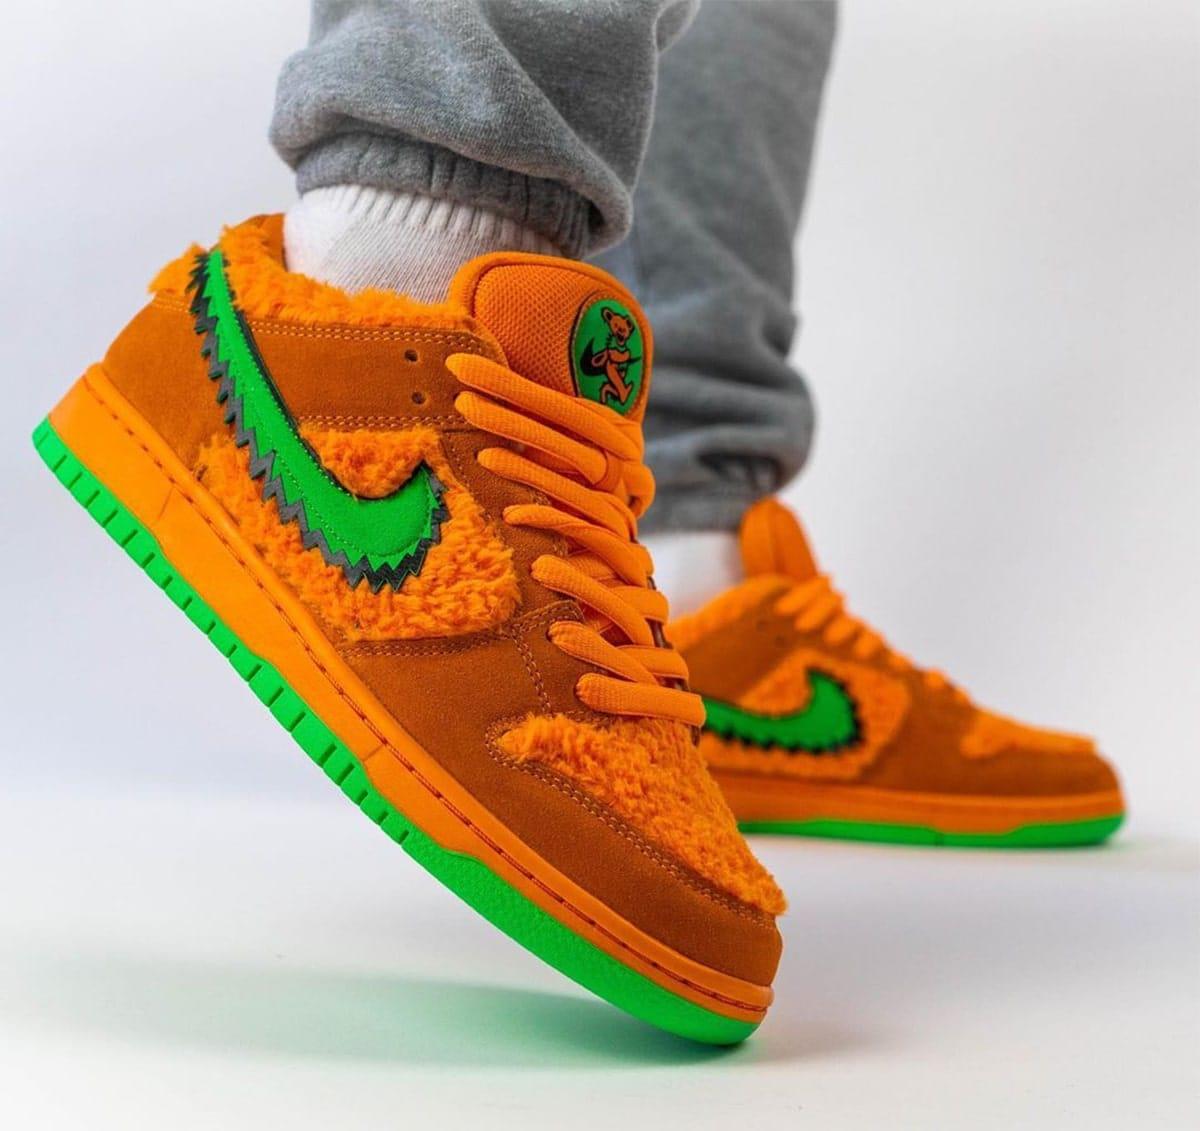 Grateful-Dead-x-Nike-SB-Dunk-Low-Orange-Bear-CJ5378-800-1